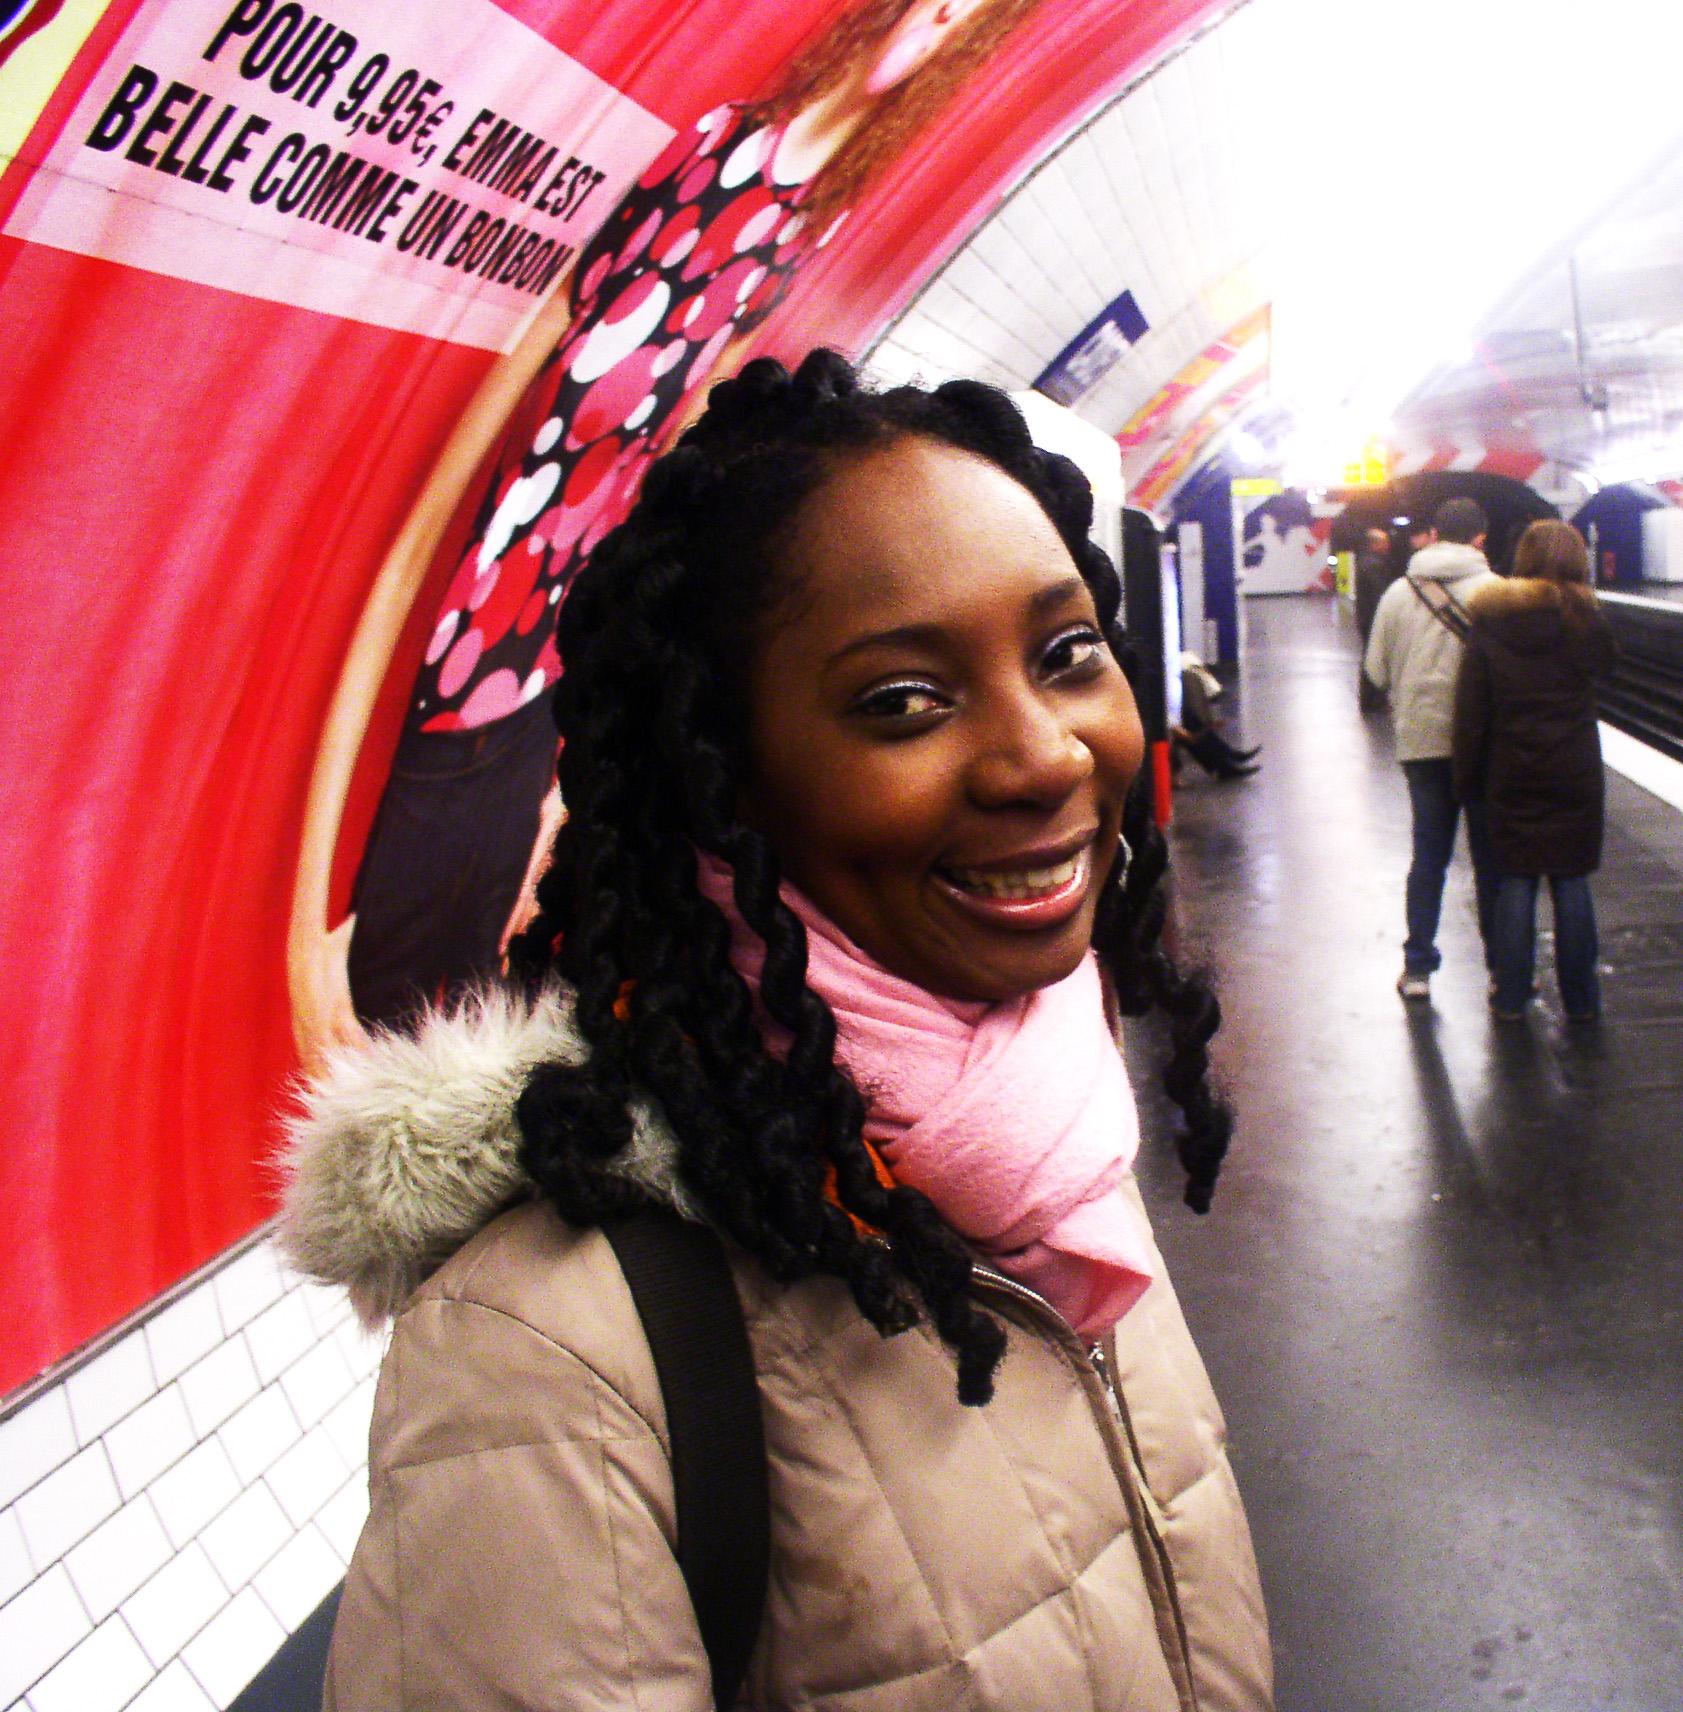 Wendy Shearer in the Metro in Paris